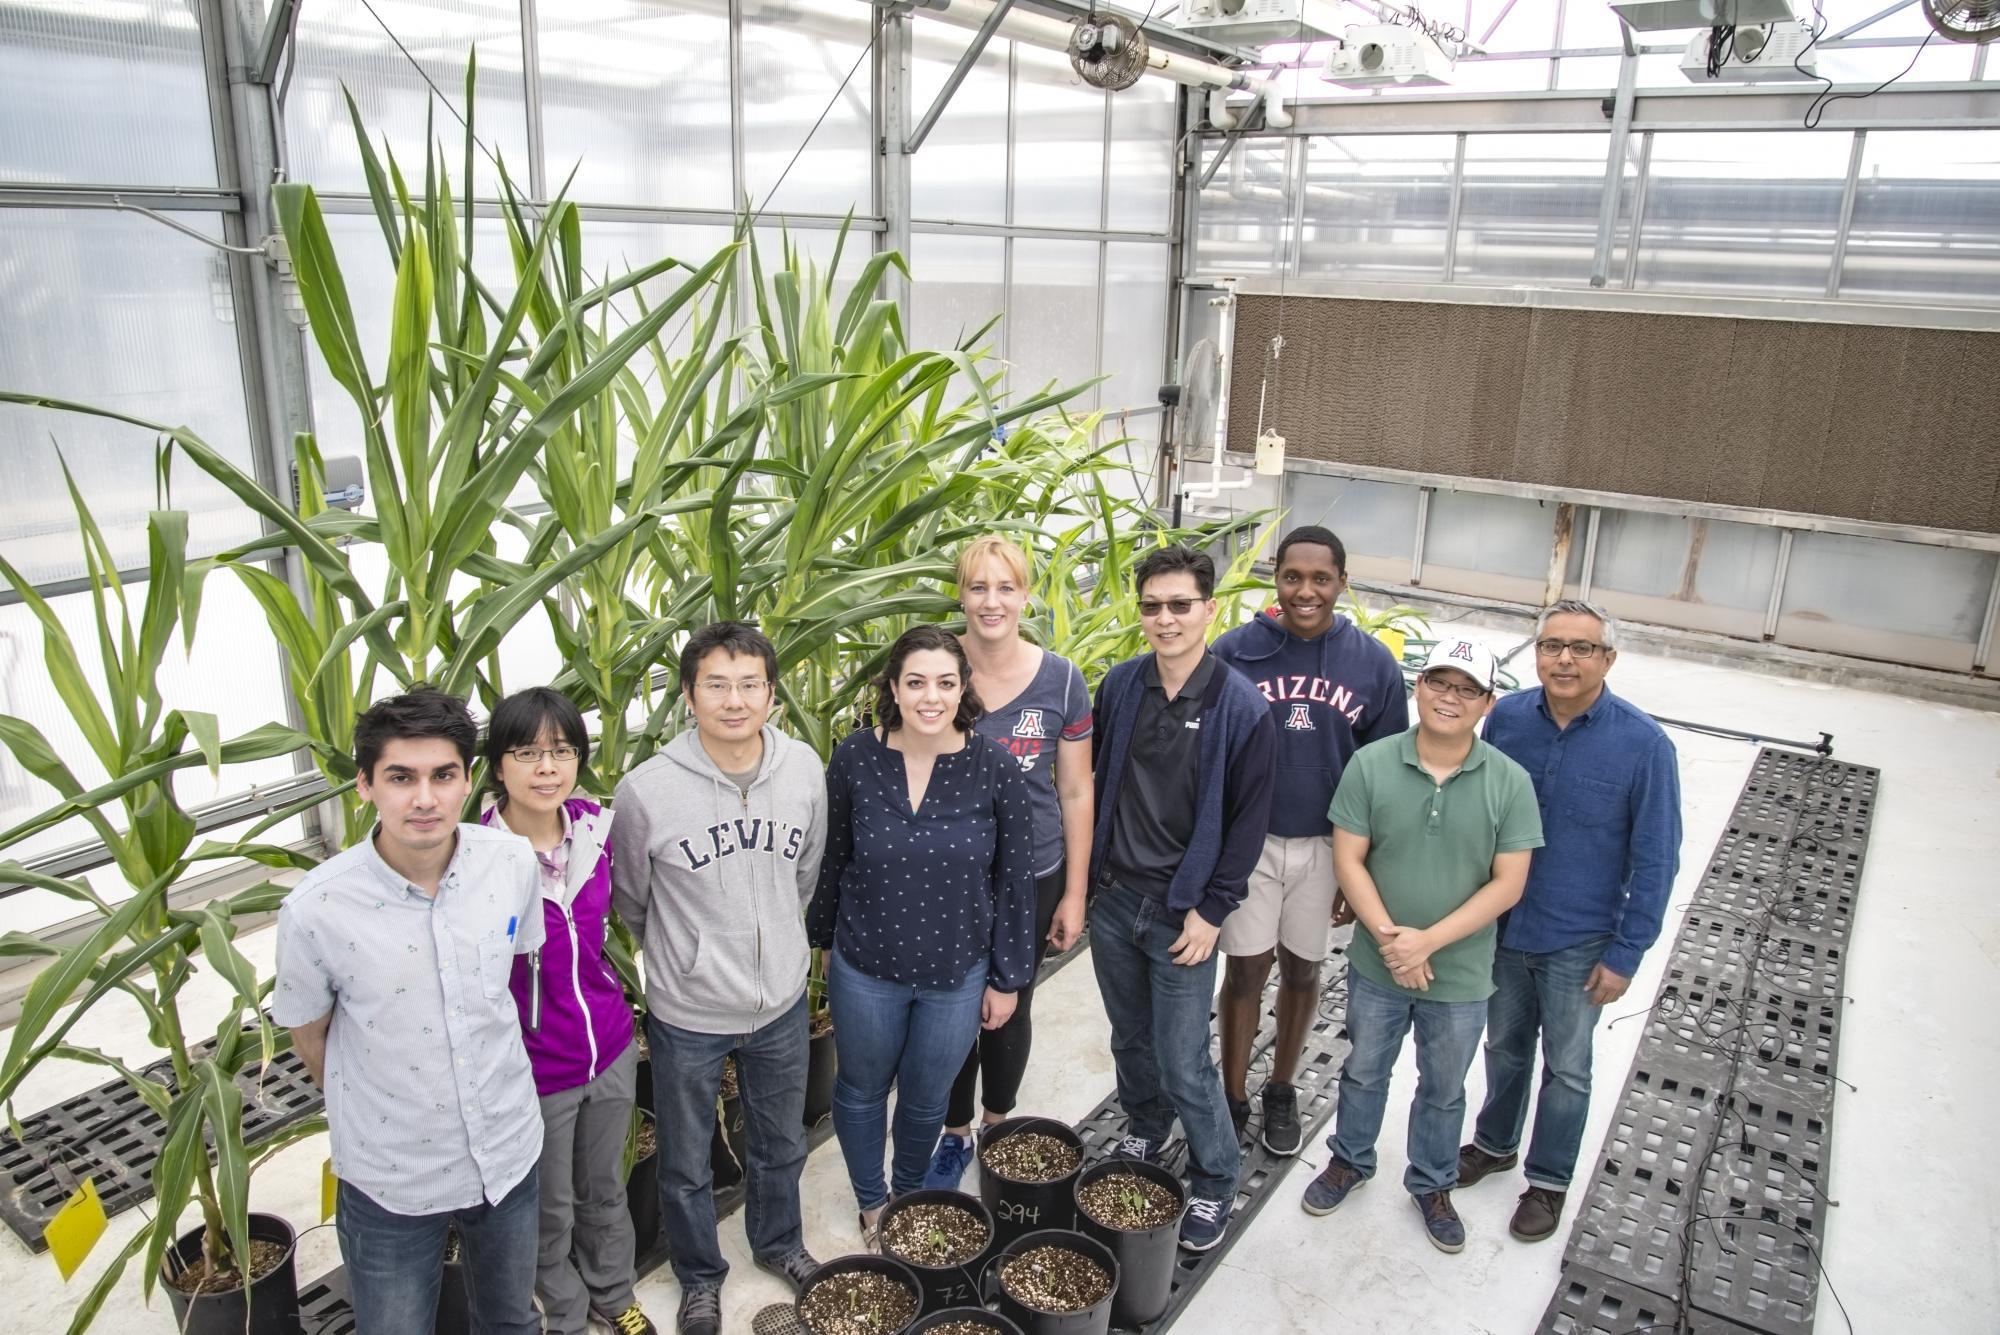 The Yadegari Group, from left: Syed Ali Shareef, Shanshan Zhang, Guosheng Li, Daniela Gutierrez, Patricia Ramsay, Choon-Hwan Ryu, Pierce Longmire, Junpeng Zhan and Ramin Yadegari, principal investigator.